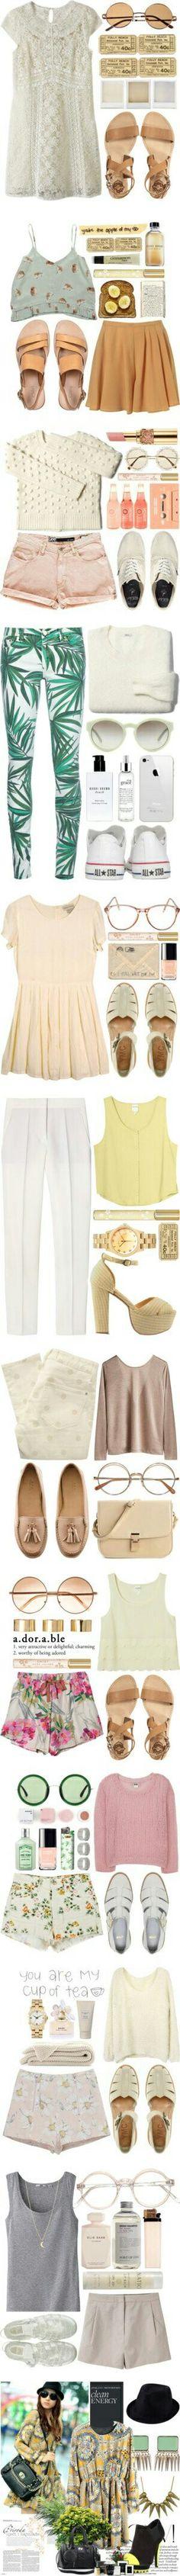 Liz Sutton Casual Style ☀️